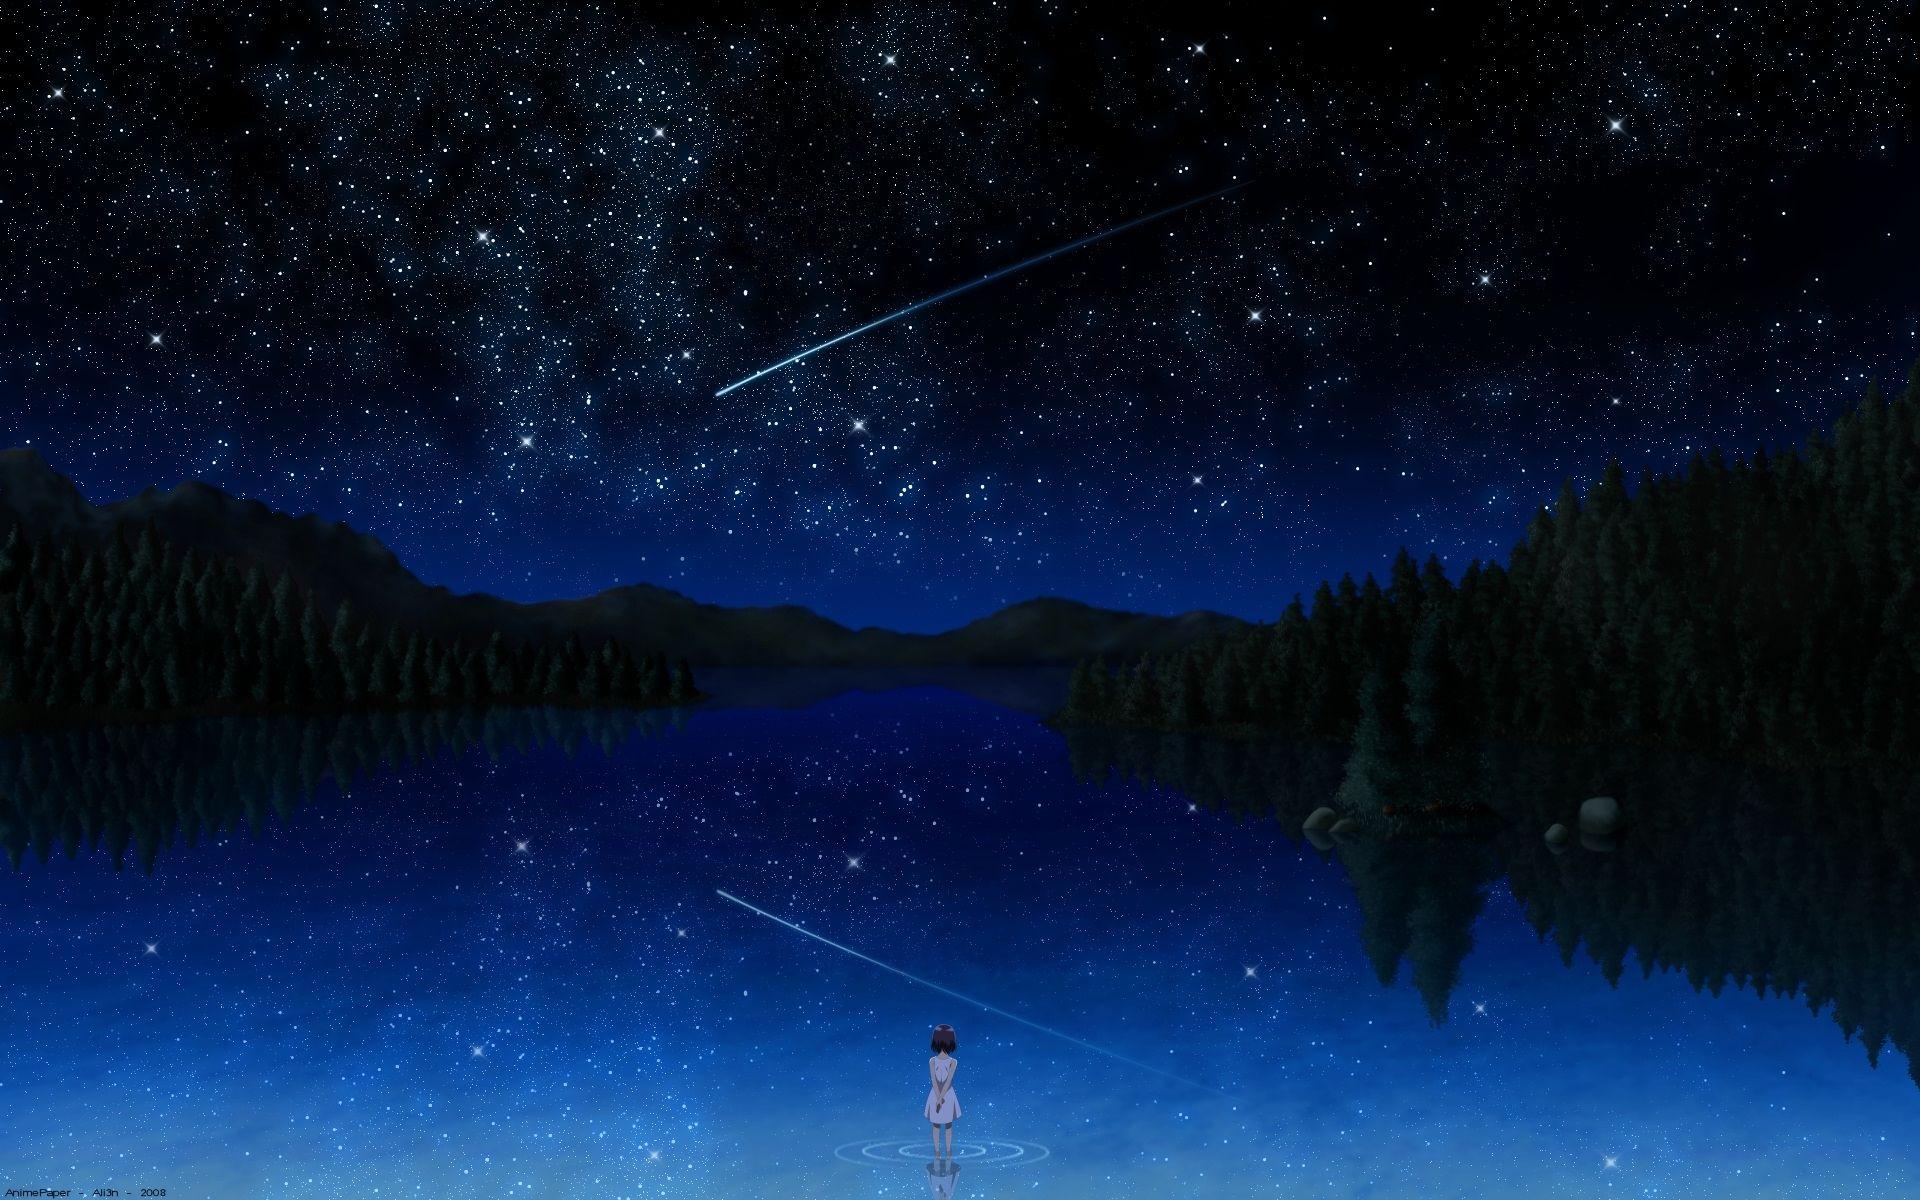 Night Sky Bai Falling Stars Anime Girls Reflections Lakes Shooting Star Anime Darker Than Black Forests Anime Scenery Anime Scenery Wallpaper Scenery Wallpaper